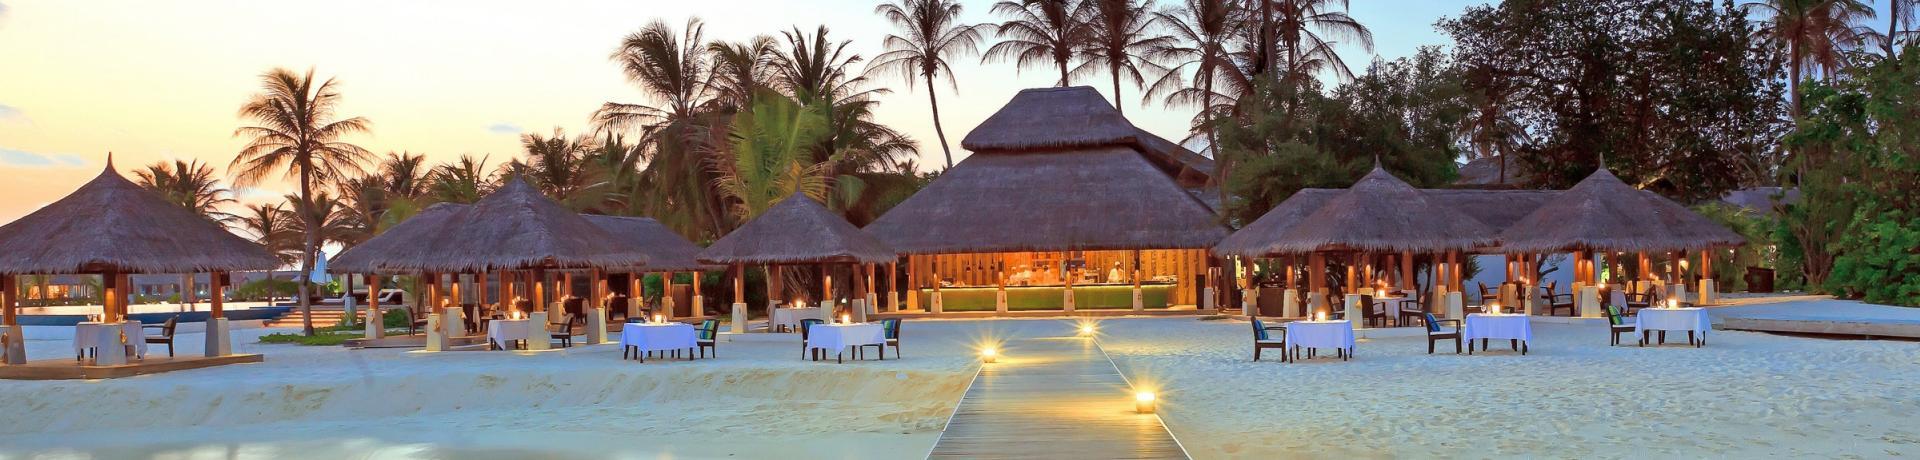 maldive-islands-resort-wide-2.jpg